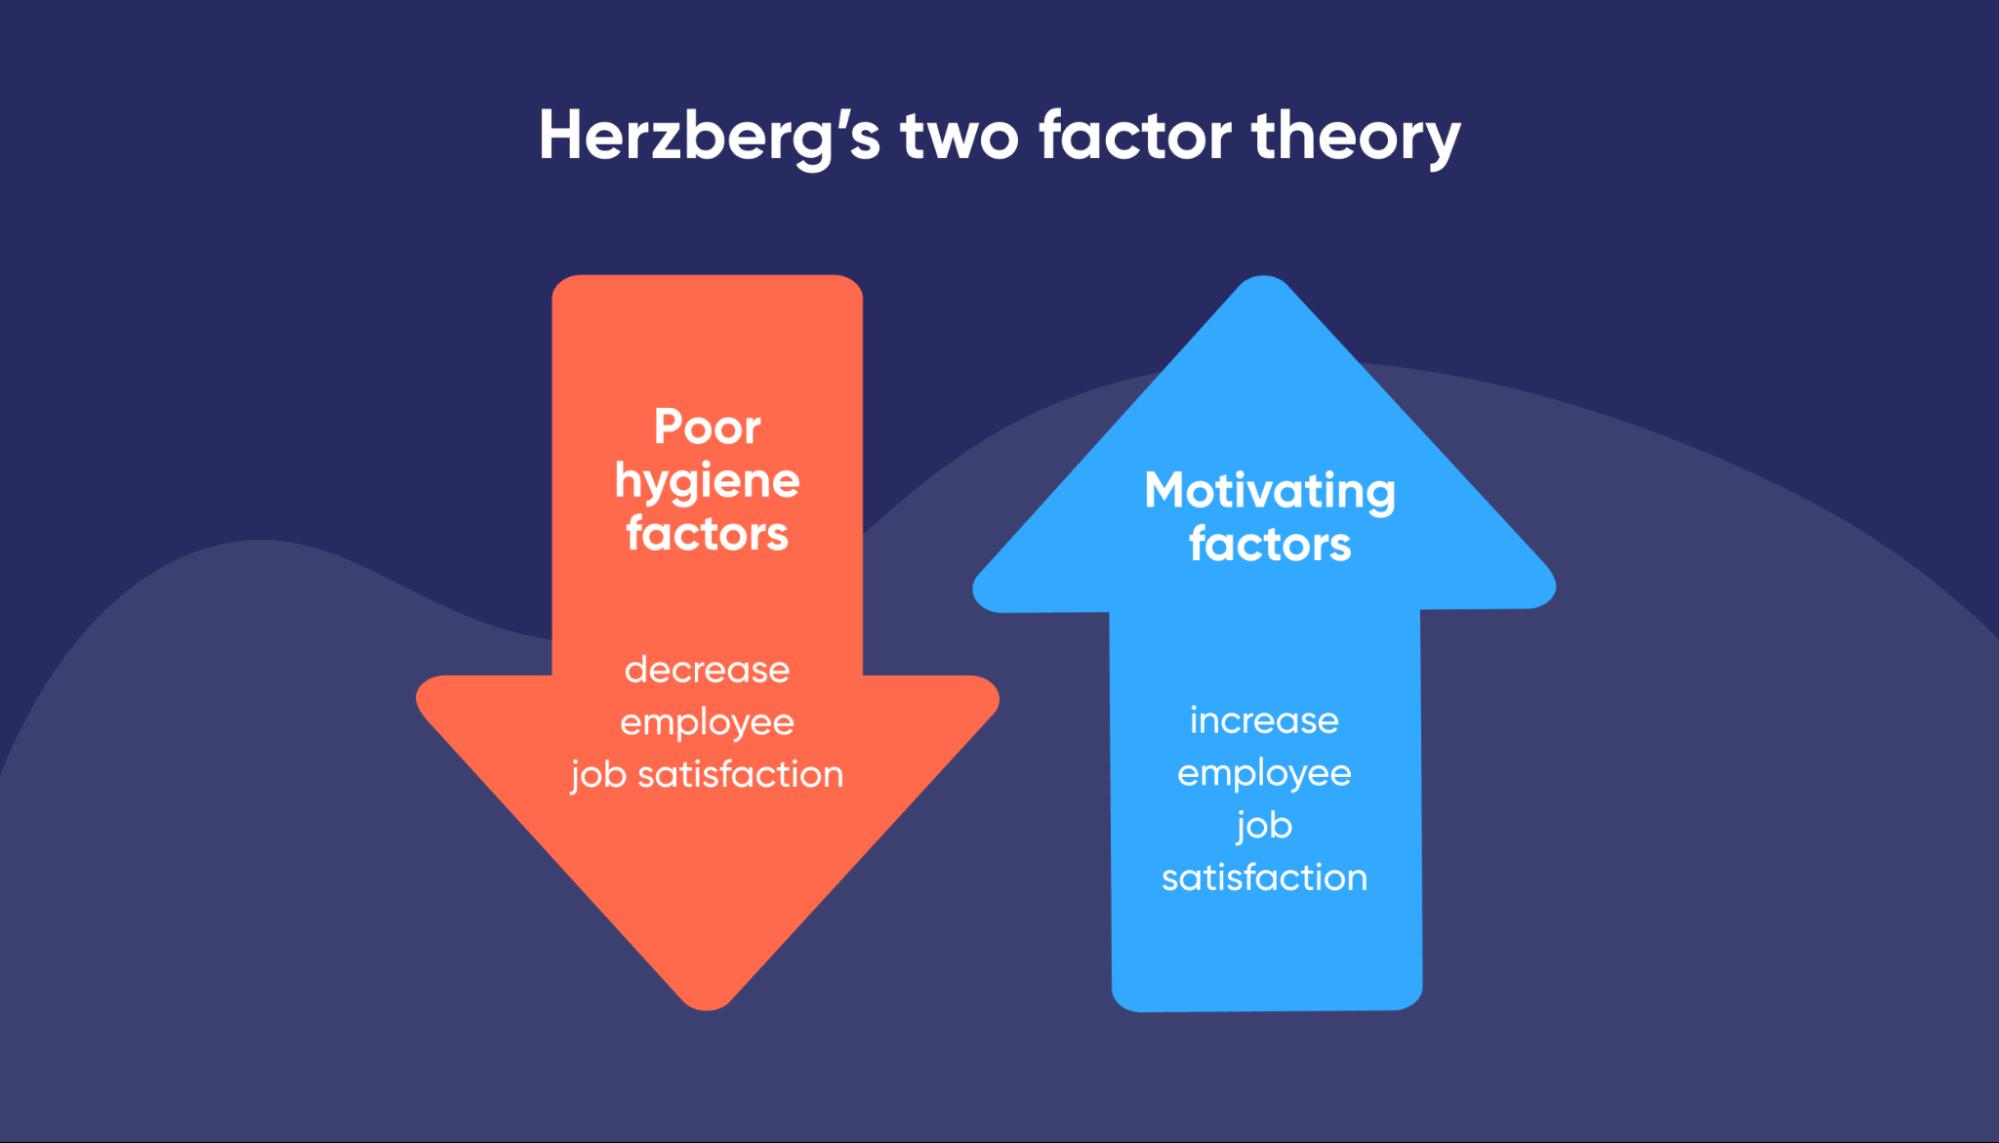 infographic-of-Herzberg's-two-factor-model-work-motivation